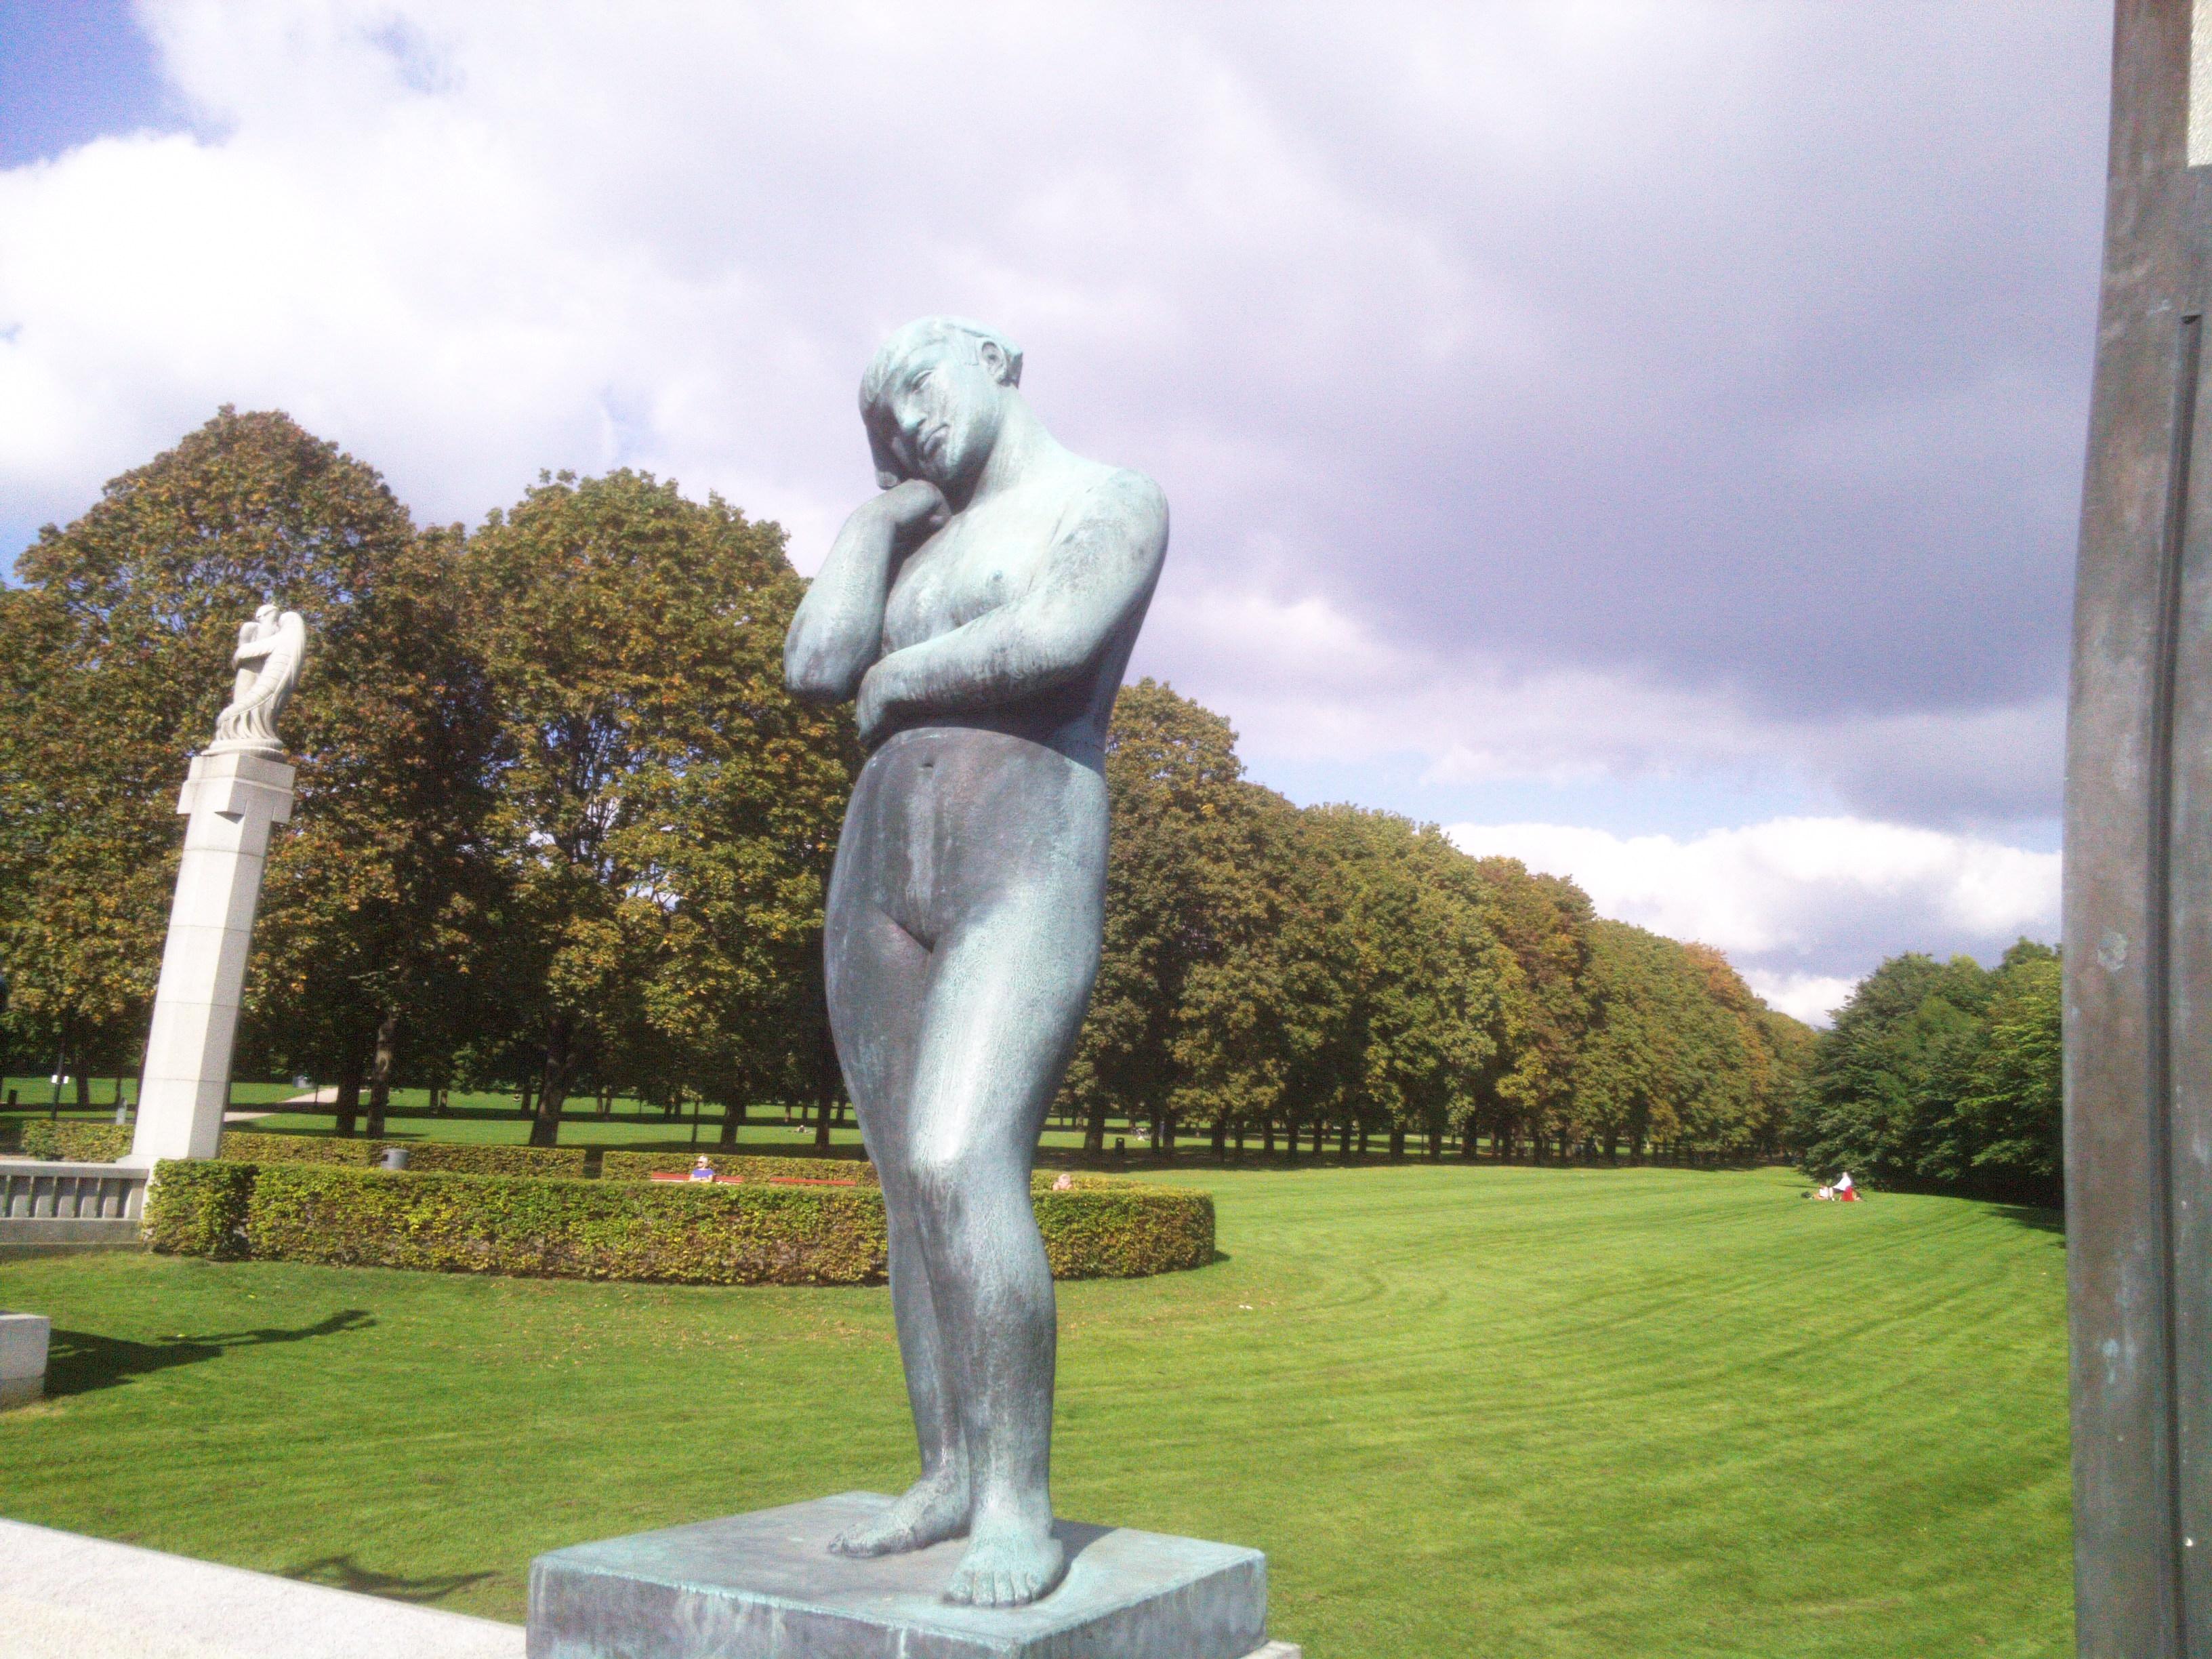 sæd hval statue